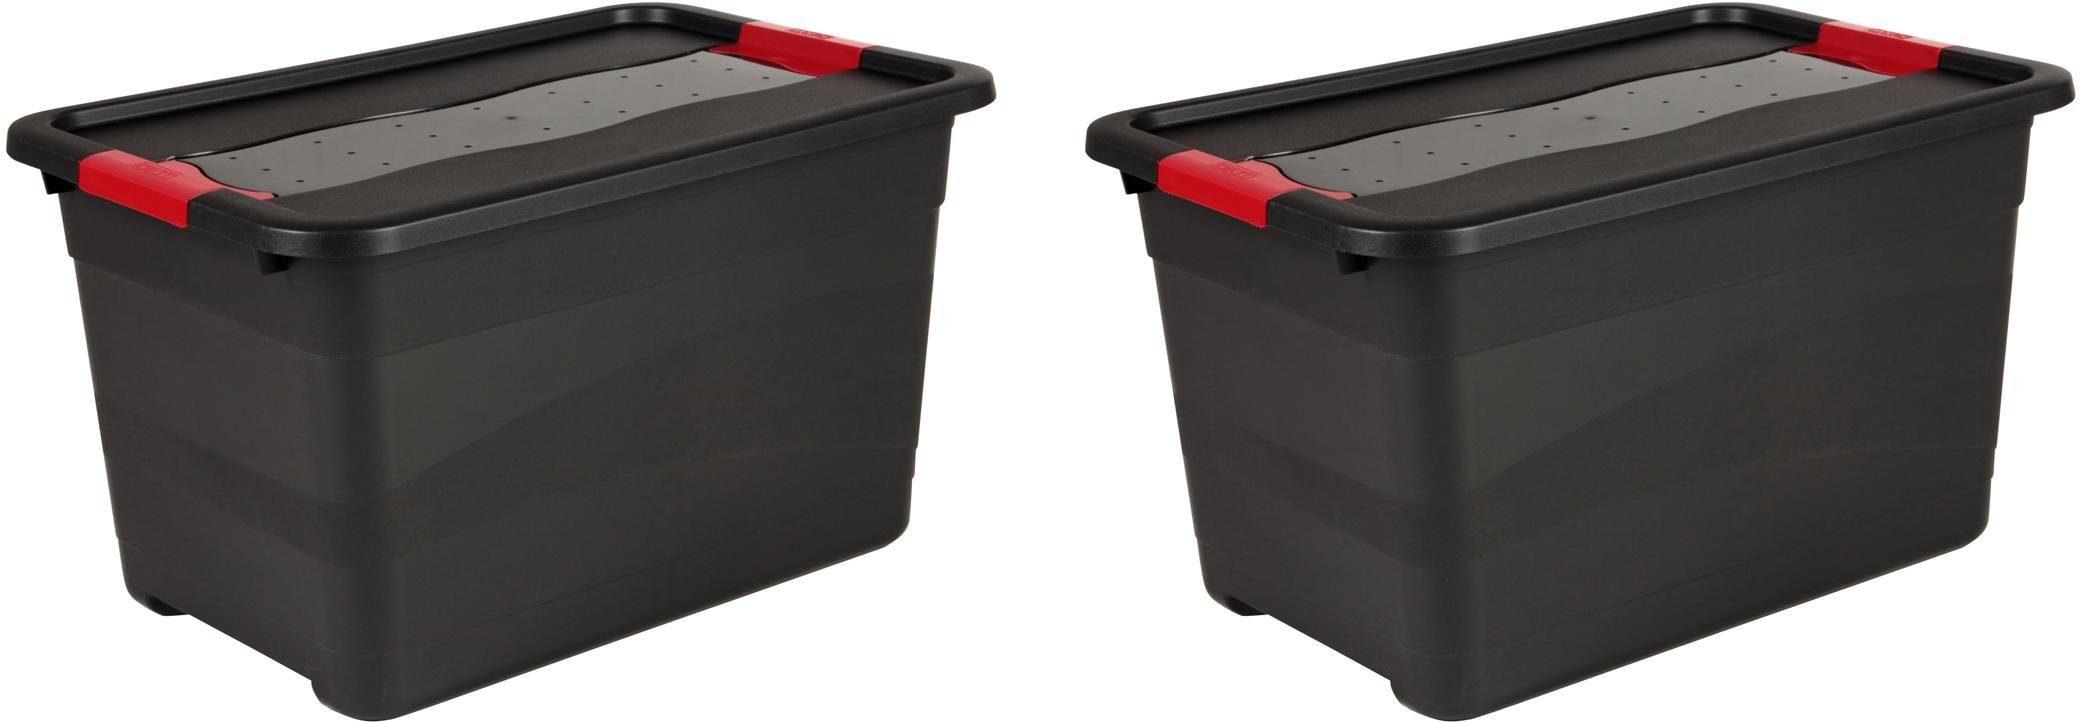 keeeper Transportbehälter mit Deckel, 59,5 x 39,5 x 34 cm, 52 Liter, 2er Set, »eckhart«